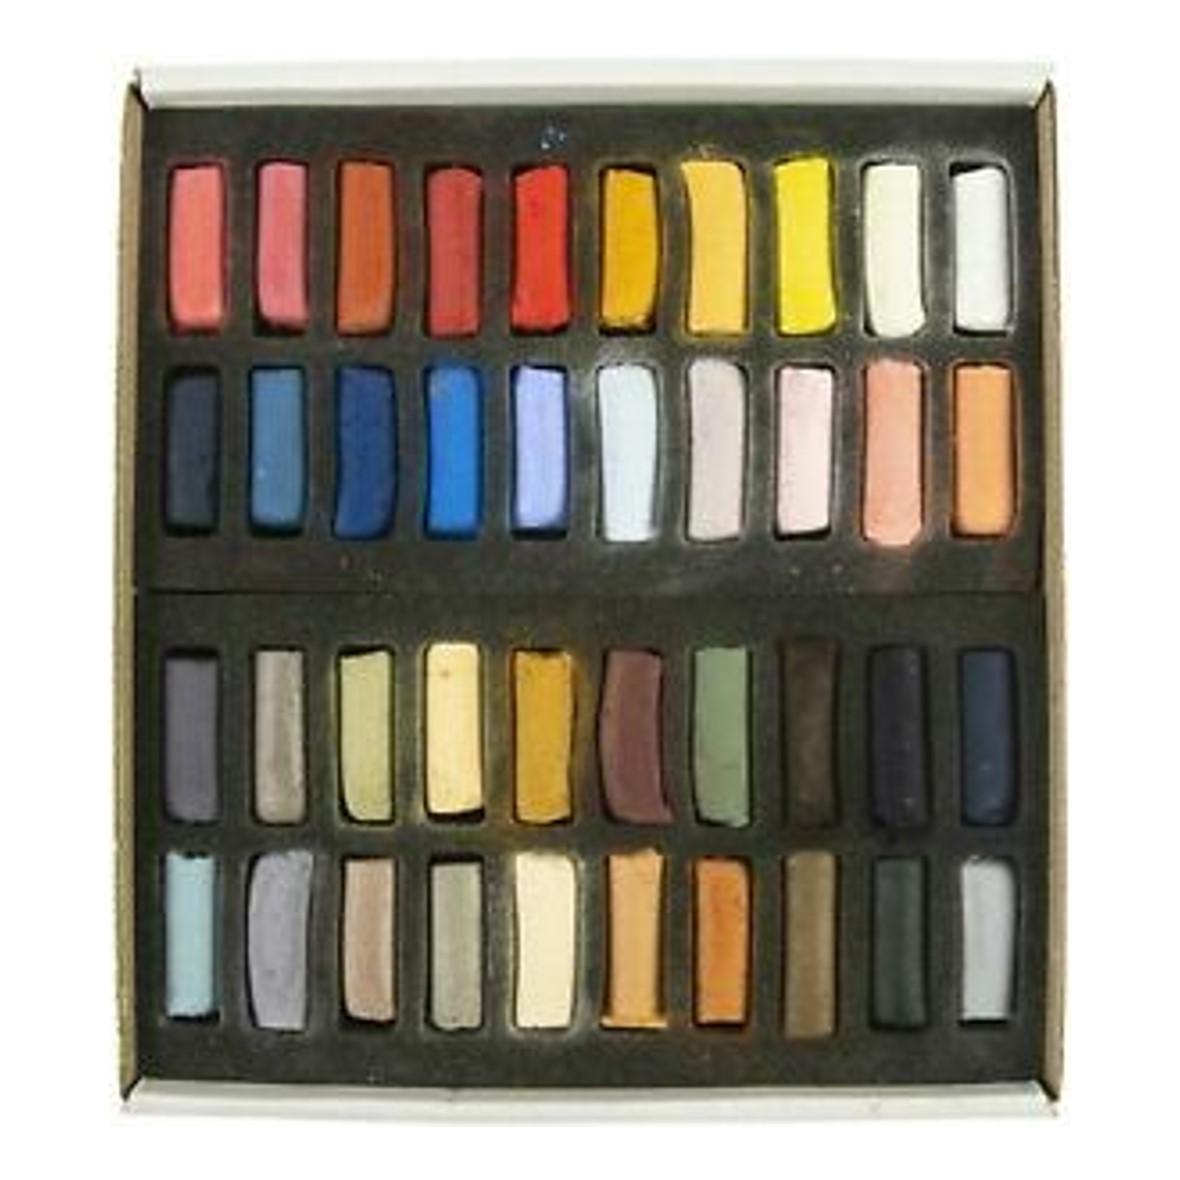 Sennelier 'Portrait' Extra Soft Half Pastels set of 40